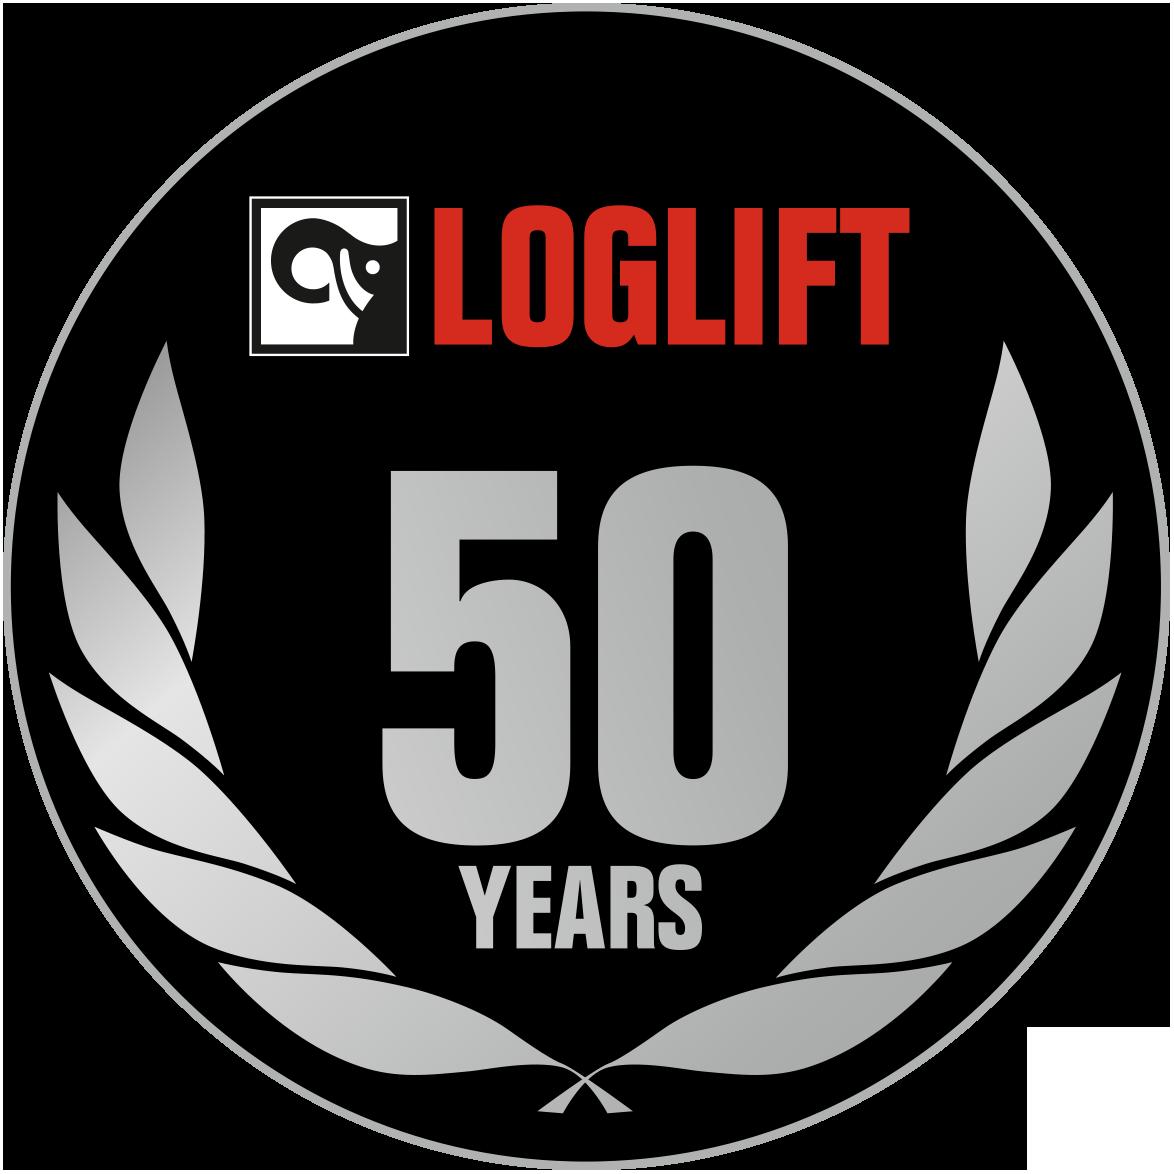 LOGLIFT_50YEARS_symbol_RGB_OUTLINE_BIG